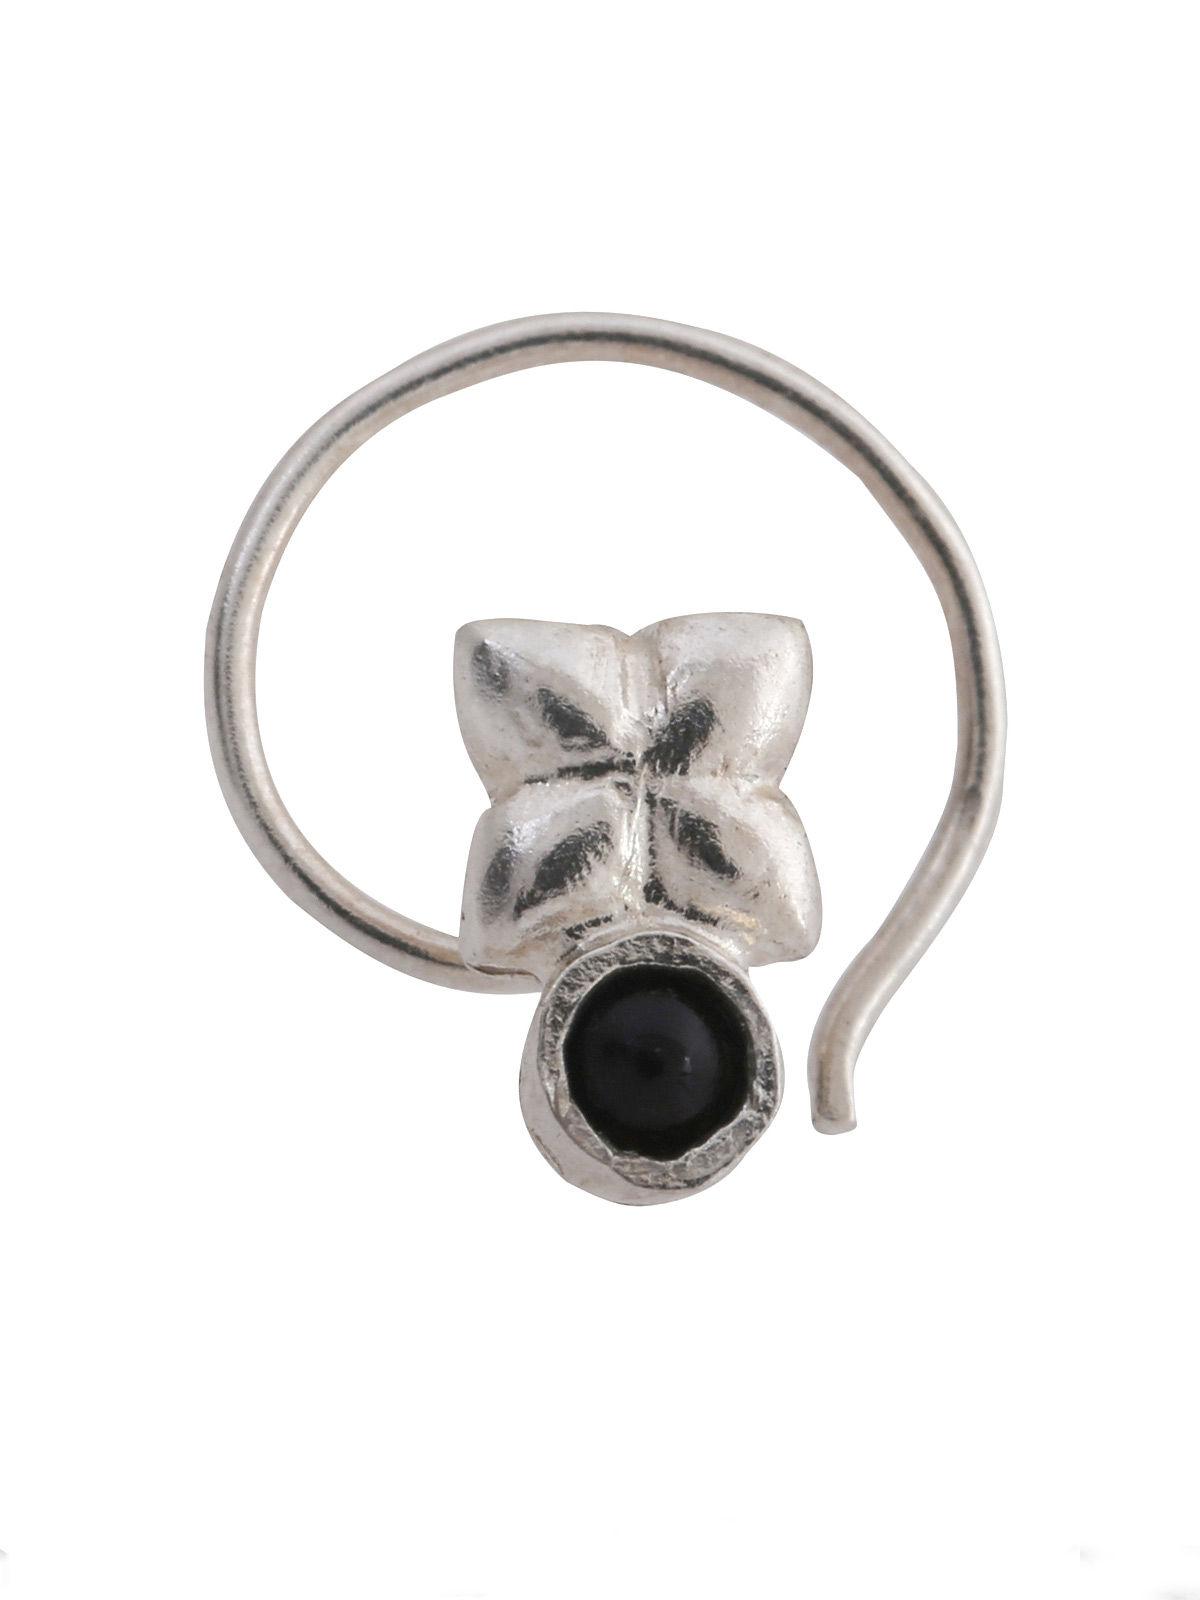 Black Silver Nose Clip with Floral Design